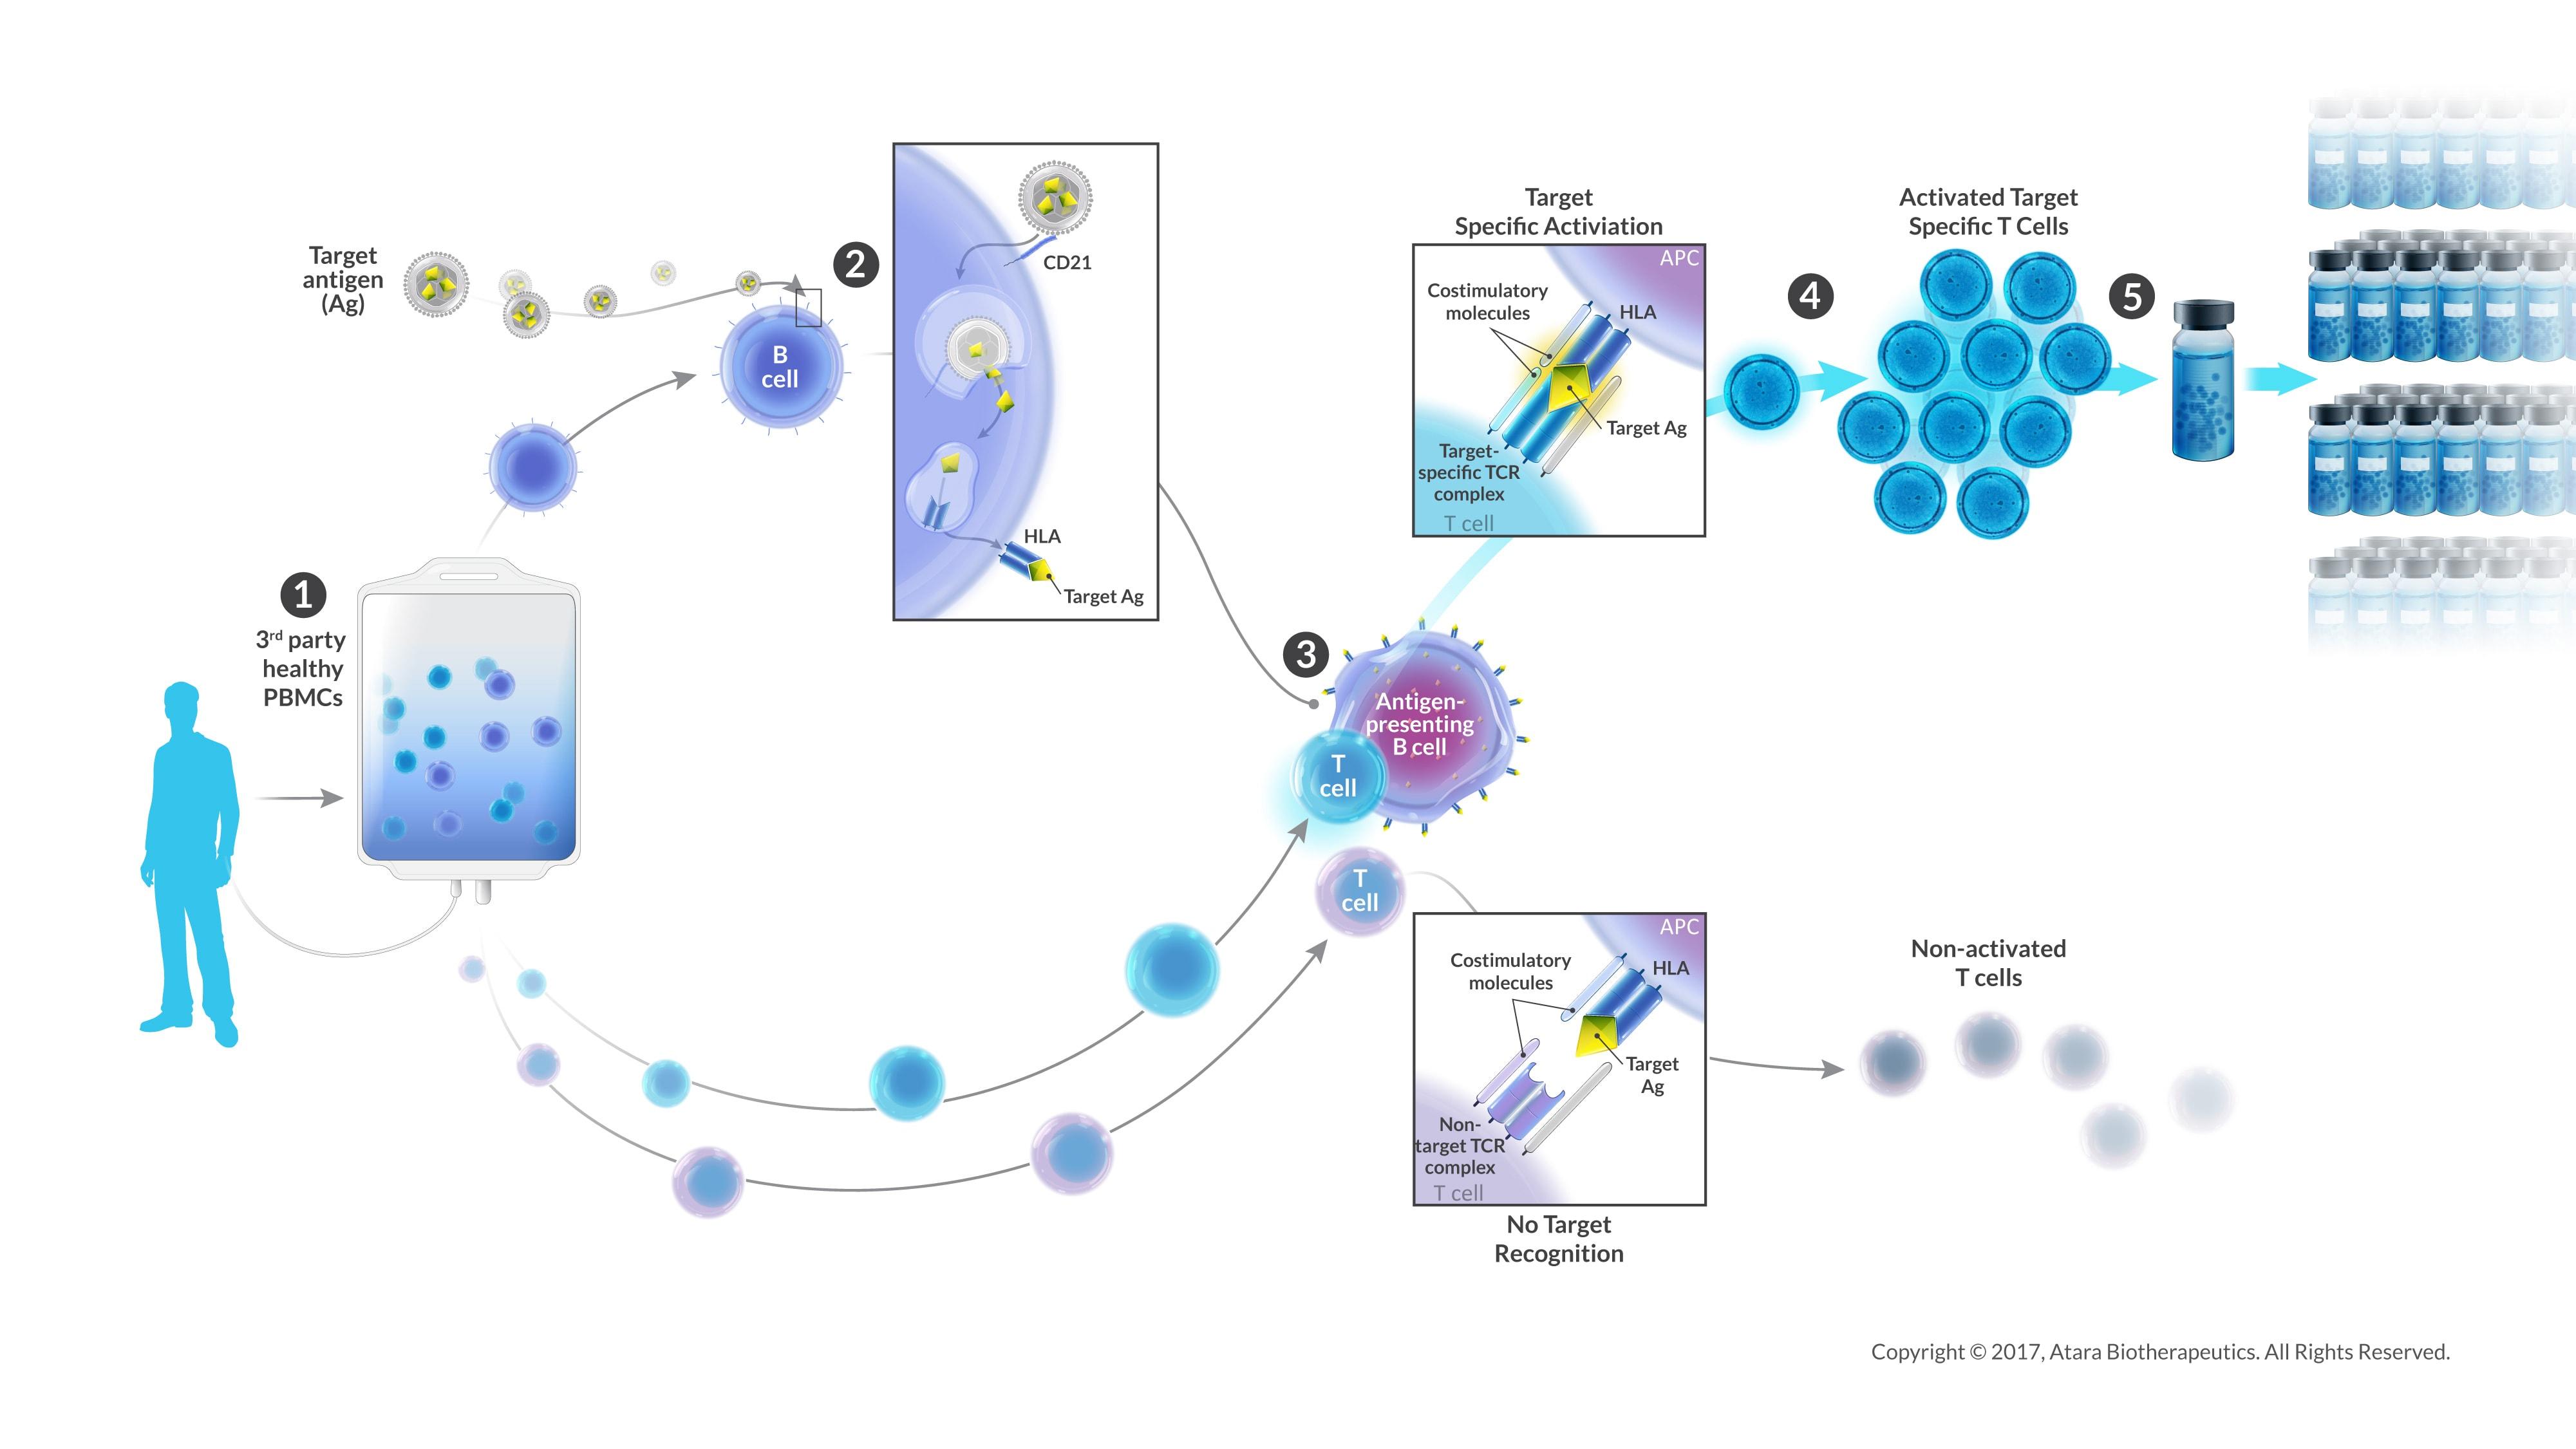 CTL Manufacturing Diagram